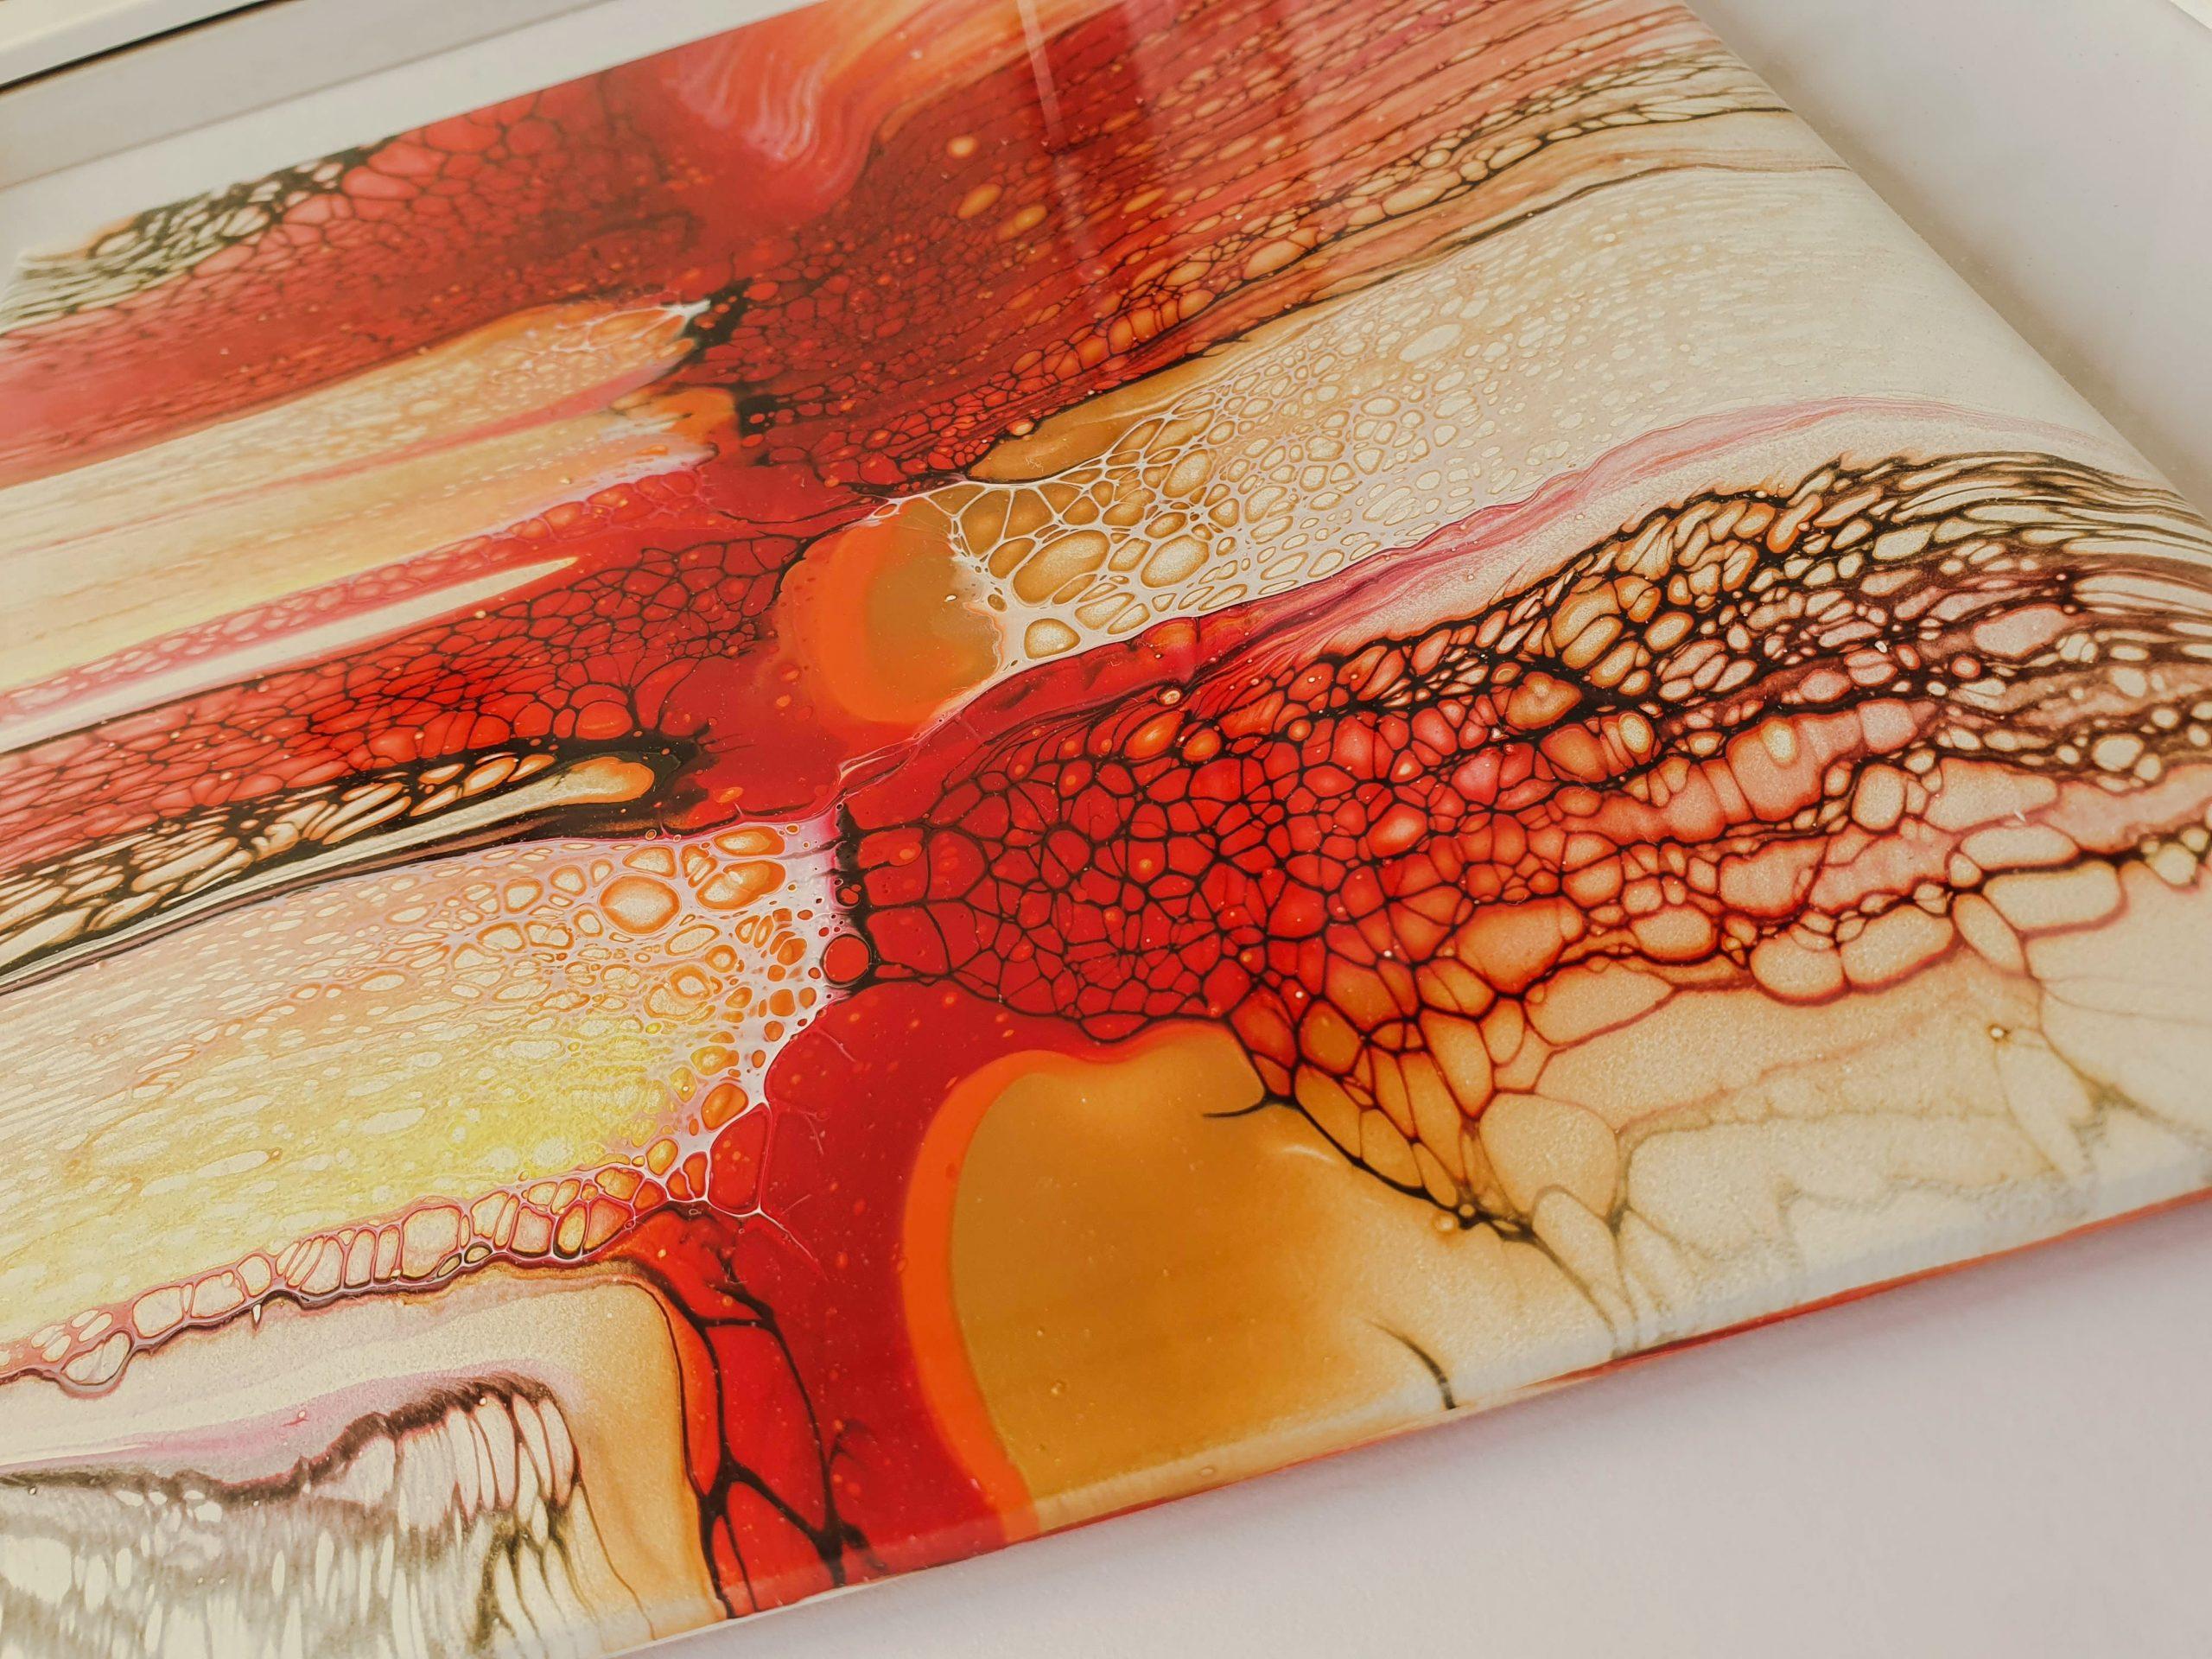 Duo Bloom Fluidart Acrylgiessen Swipe 4